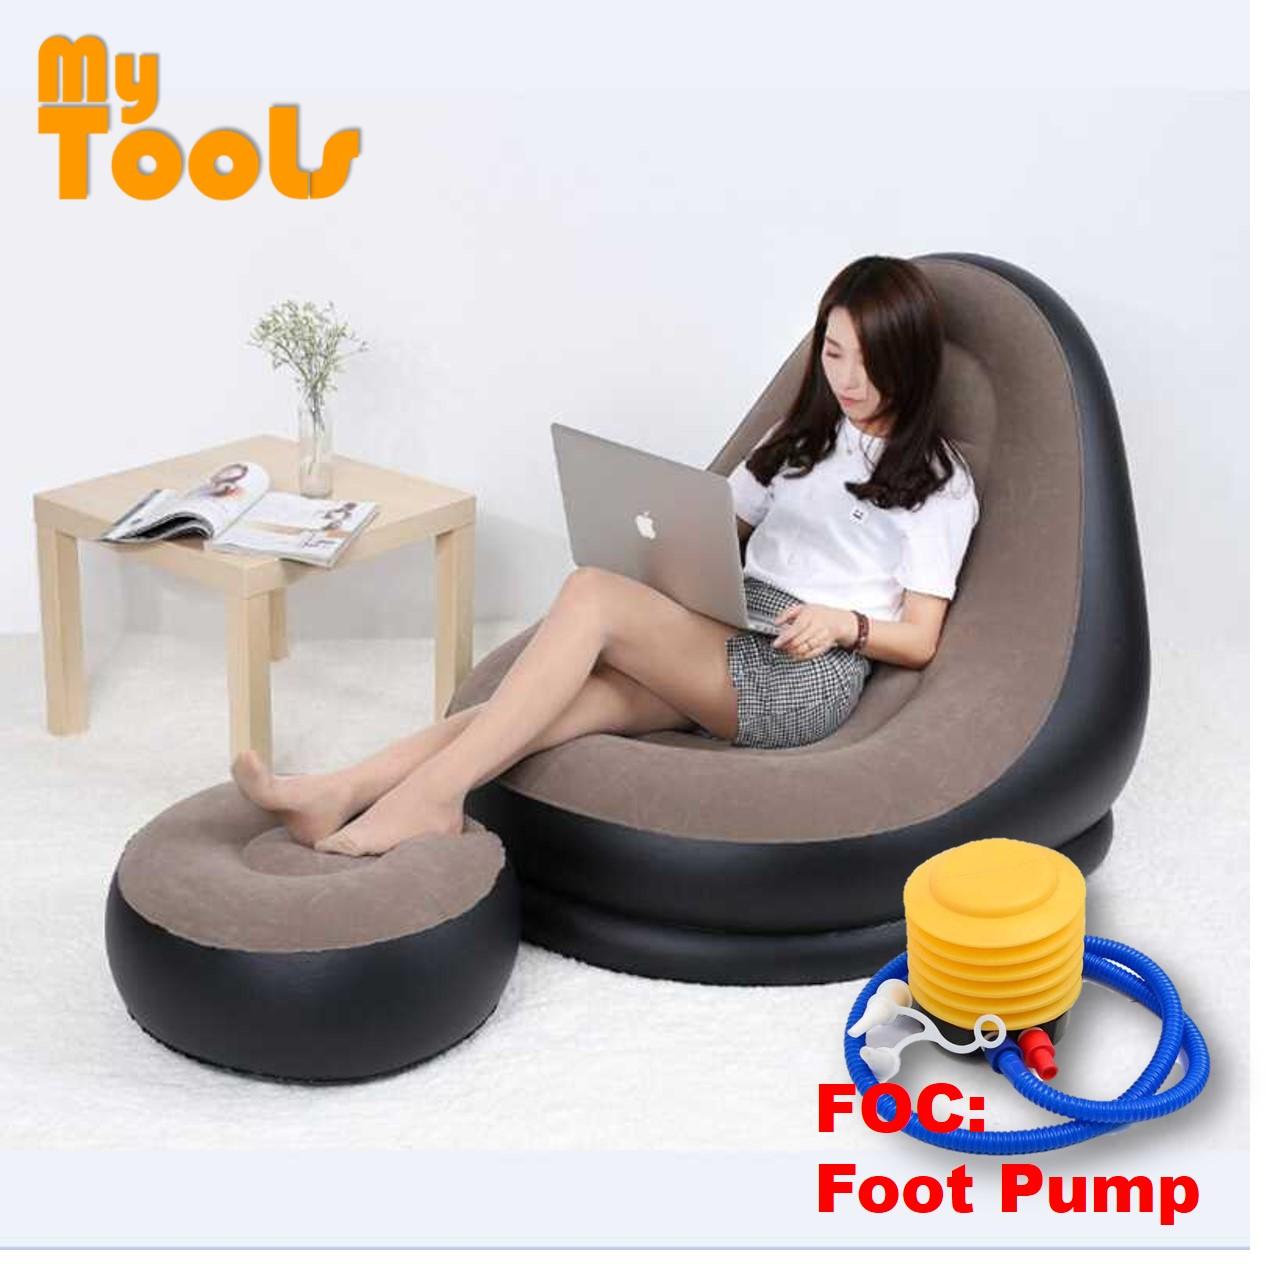 Tremendous Mytools Inflatable Air Sofa Seat Chair W Foot Rest Lounge Air Bed Mattress Foc Foot Pump Machost Co Dining Chair Design Ideas Machostcouk